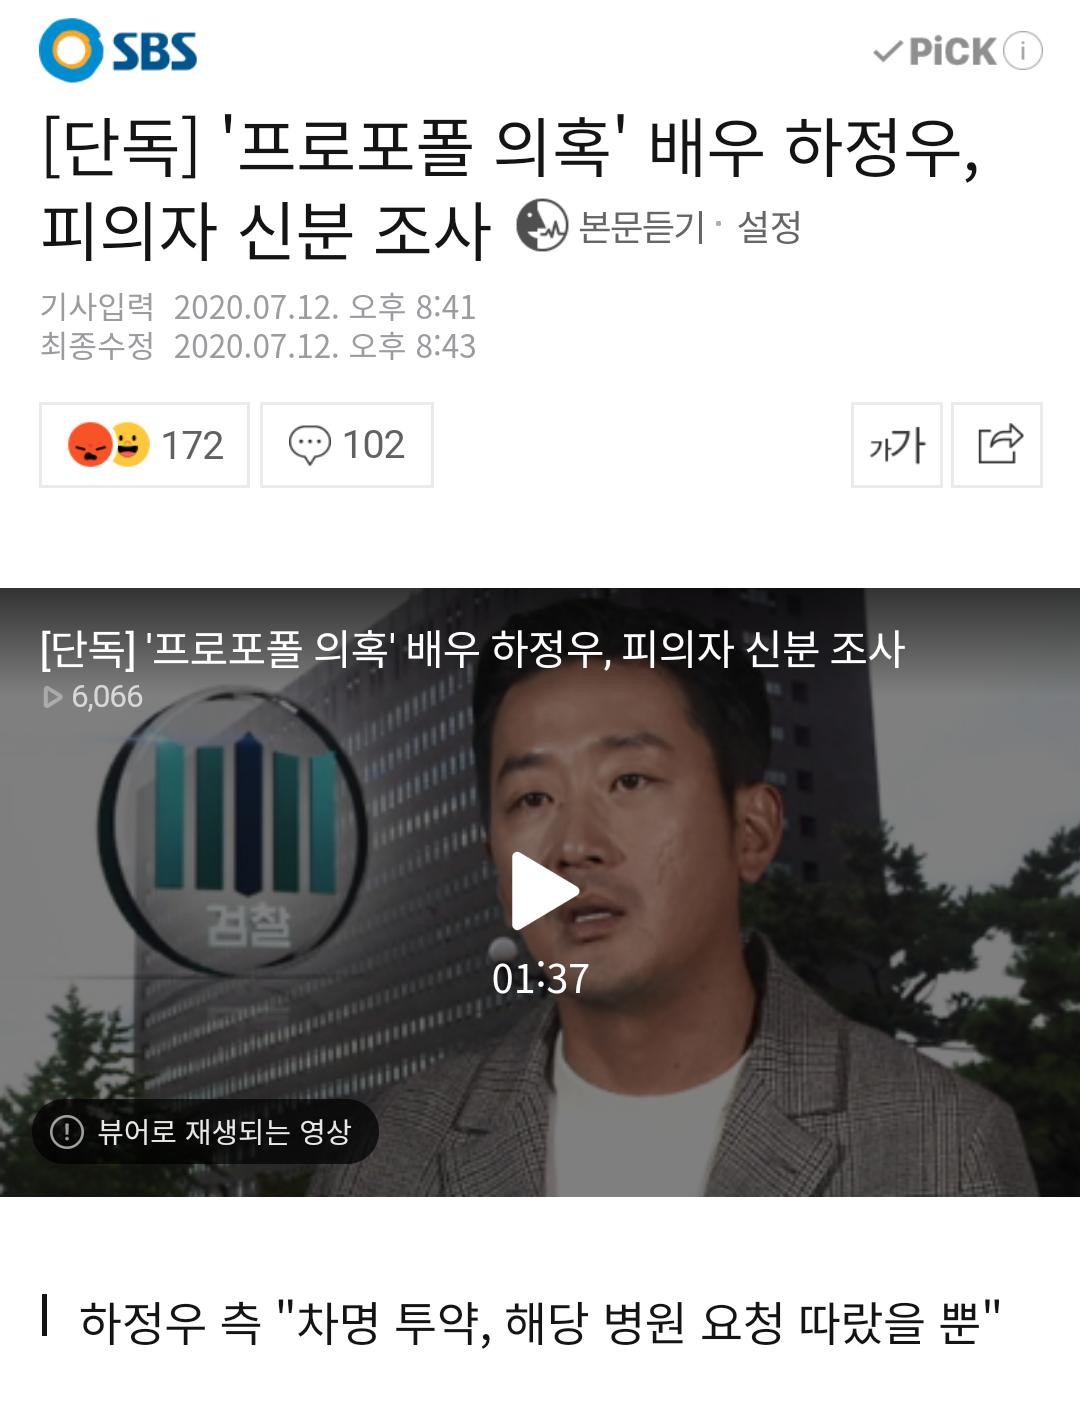 Capture+_2020-07-12-22-07-01.png [SBS] 배우 하정우, 프로포폴 의혹으로 피의자 신분 조사